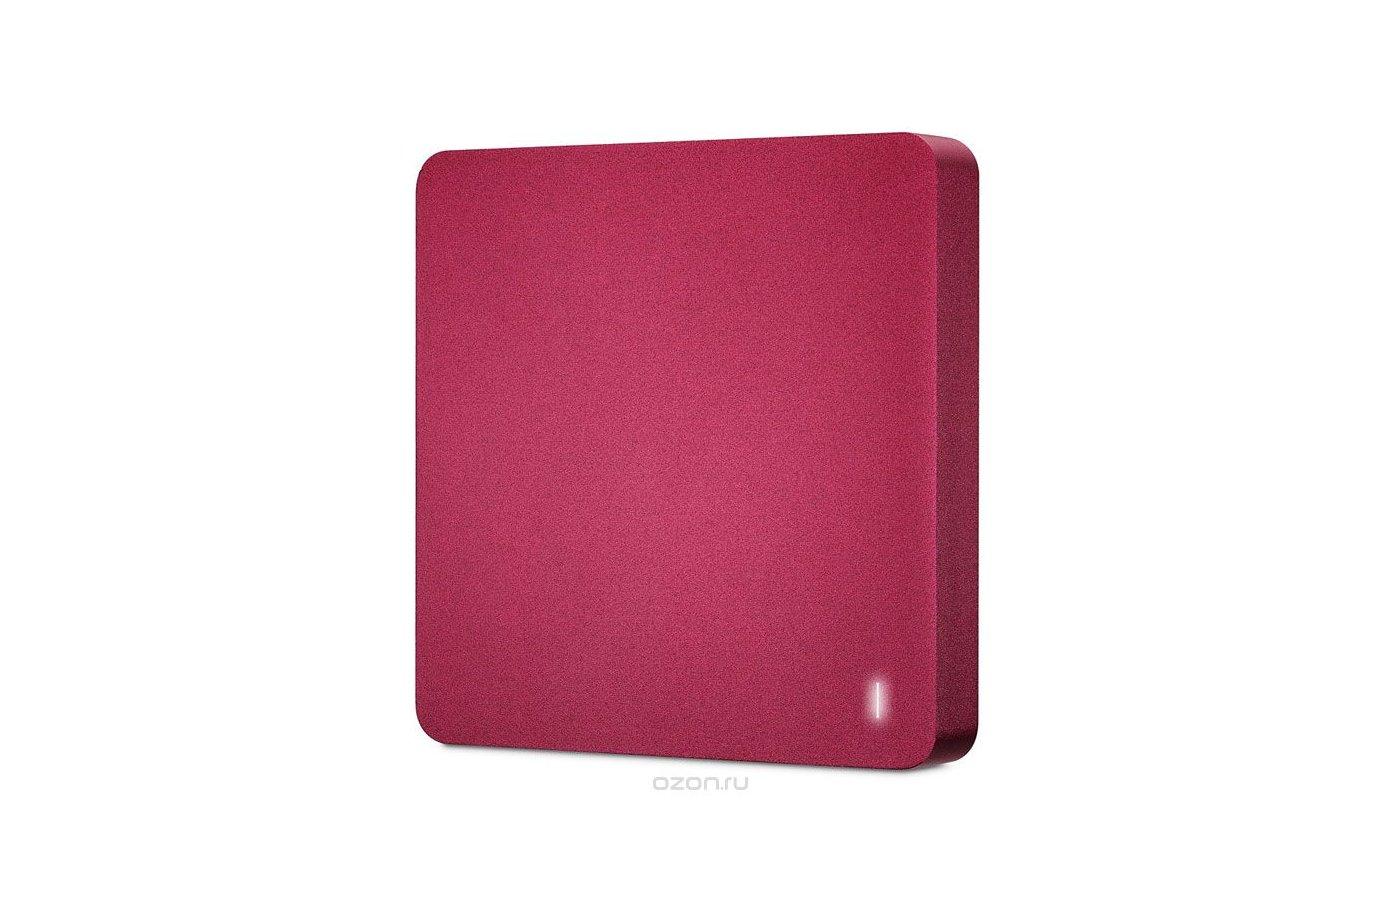 Портативный аккумулятор Calibre ULTRA GO MINI RED 3500 mAh FUMI035R4